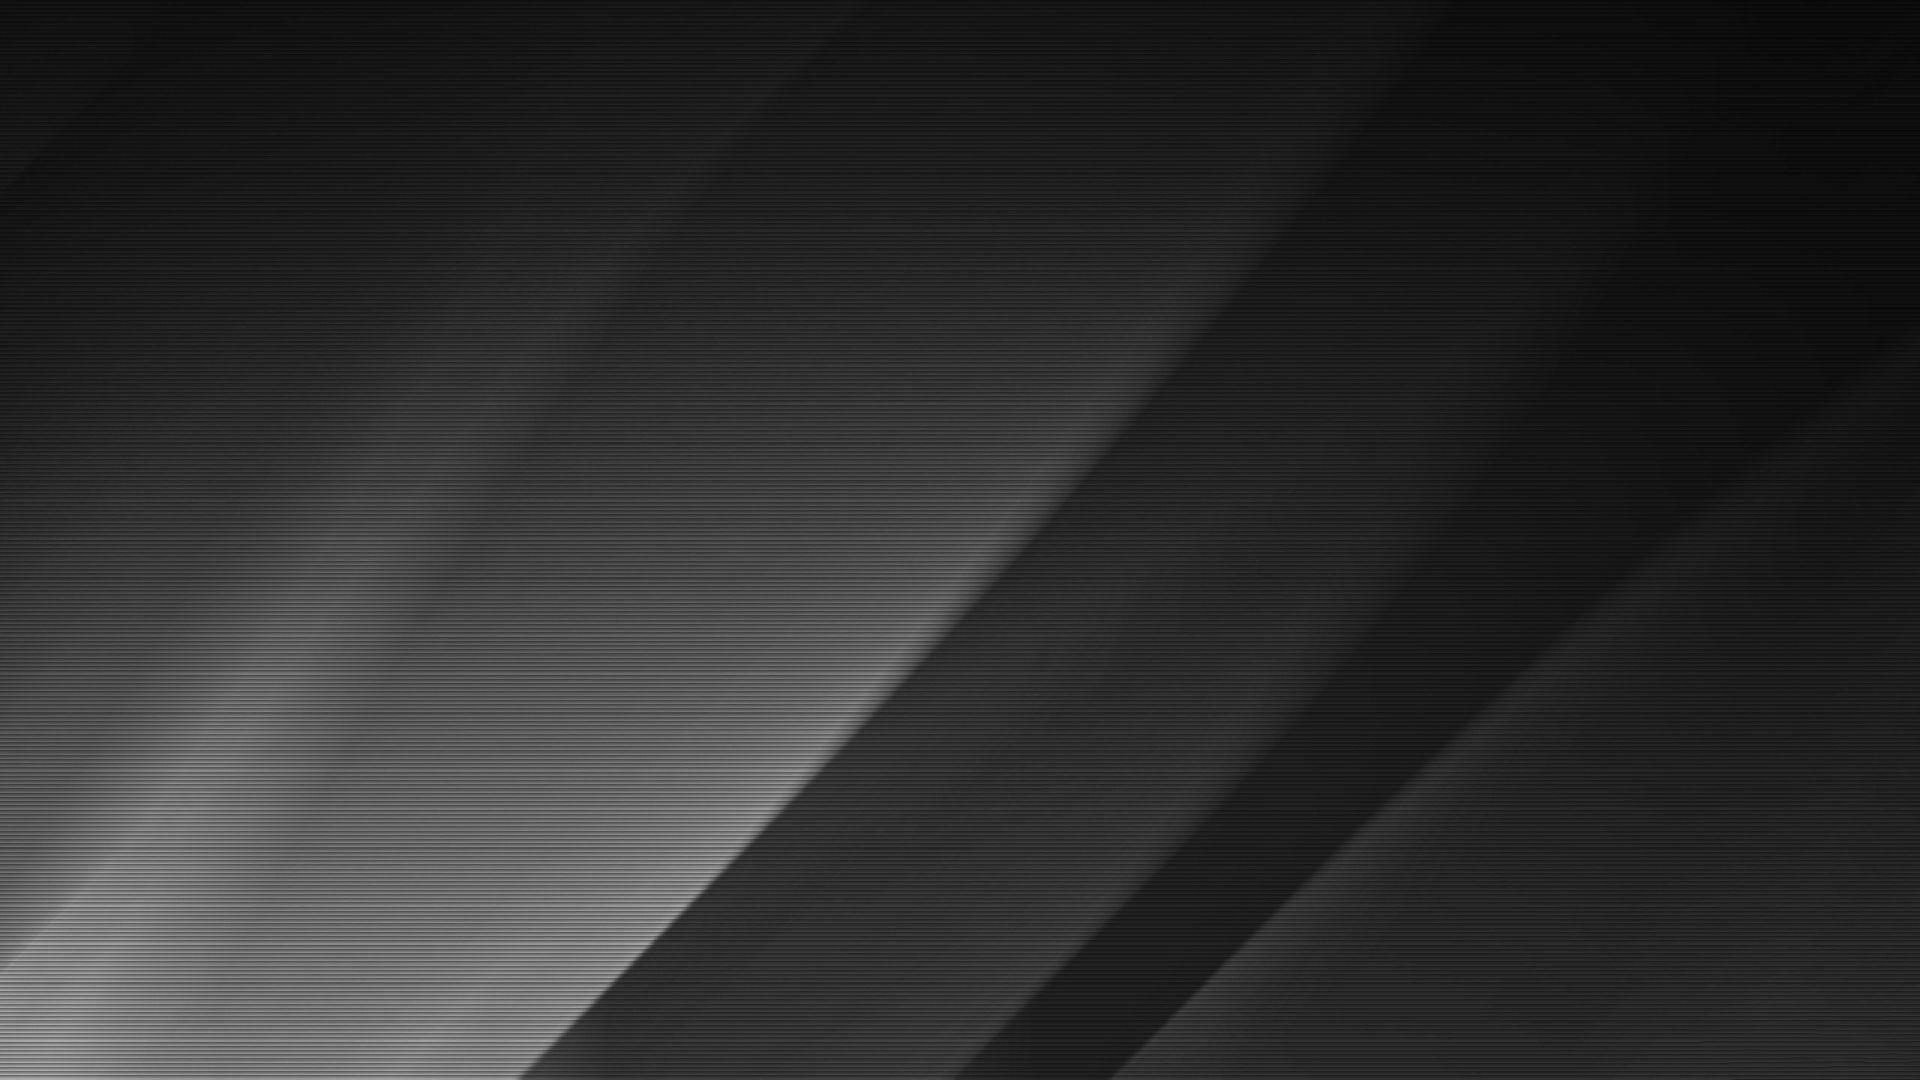 Arriere plan abstrait gris maximumwall for Fondo de pantalla gris